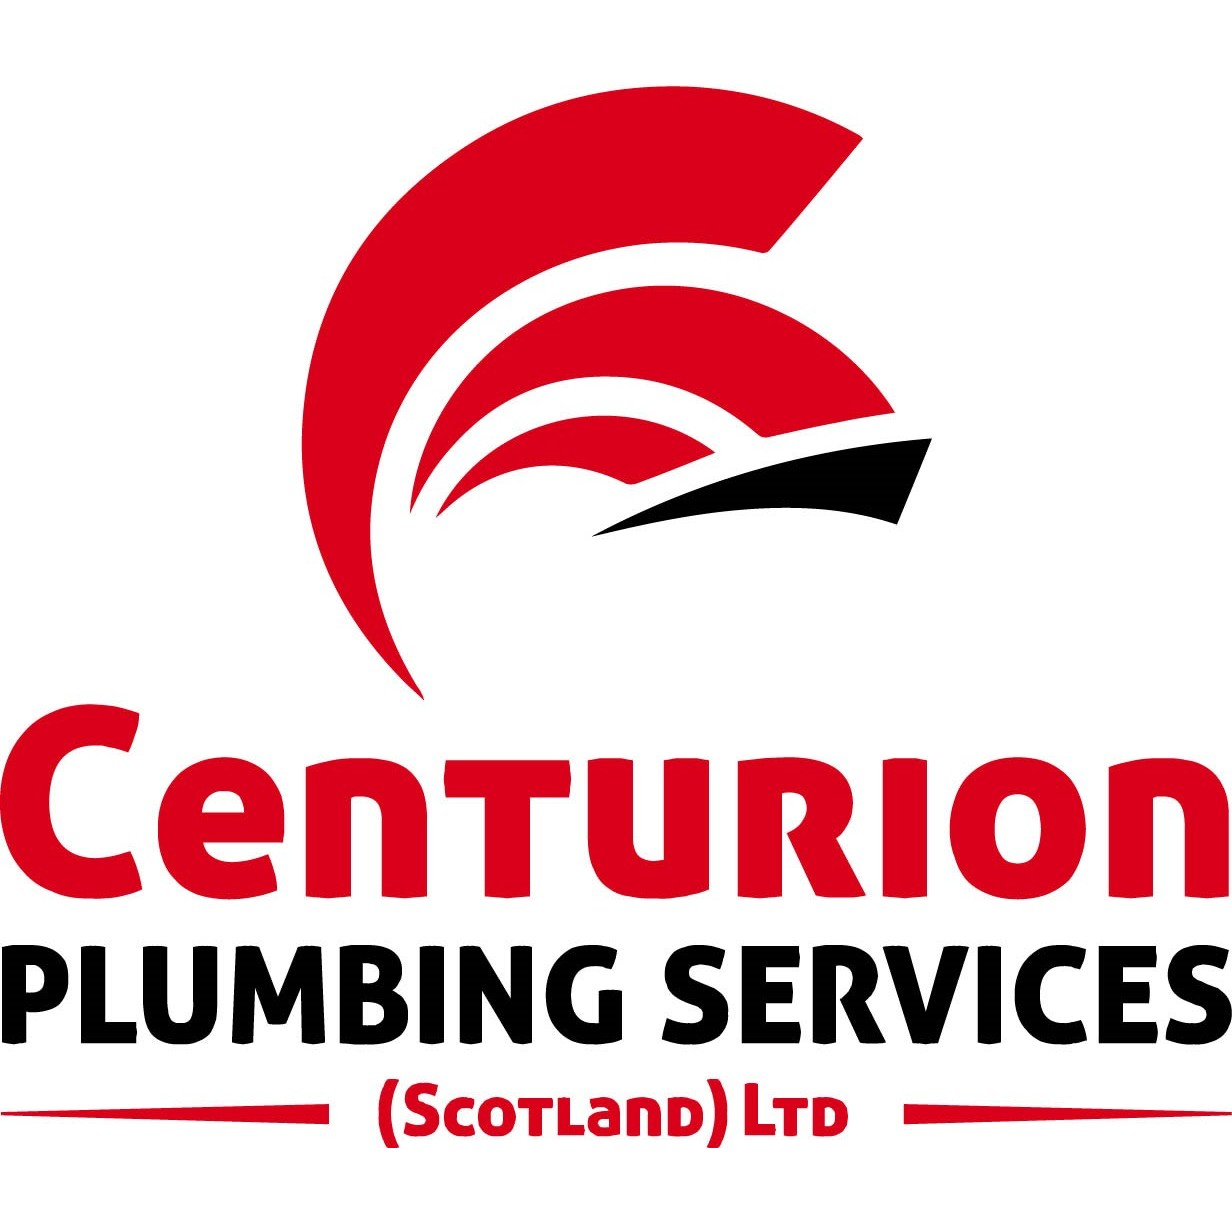 Centurion Plumbing Services (Scotland) Ltd